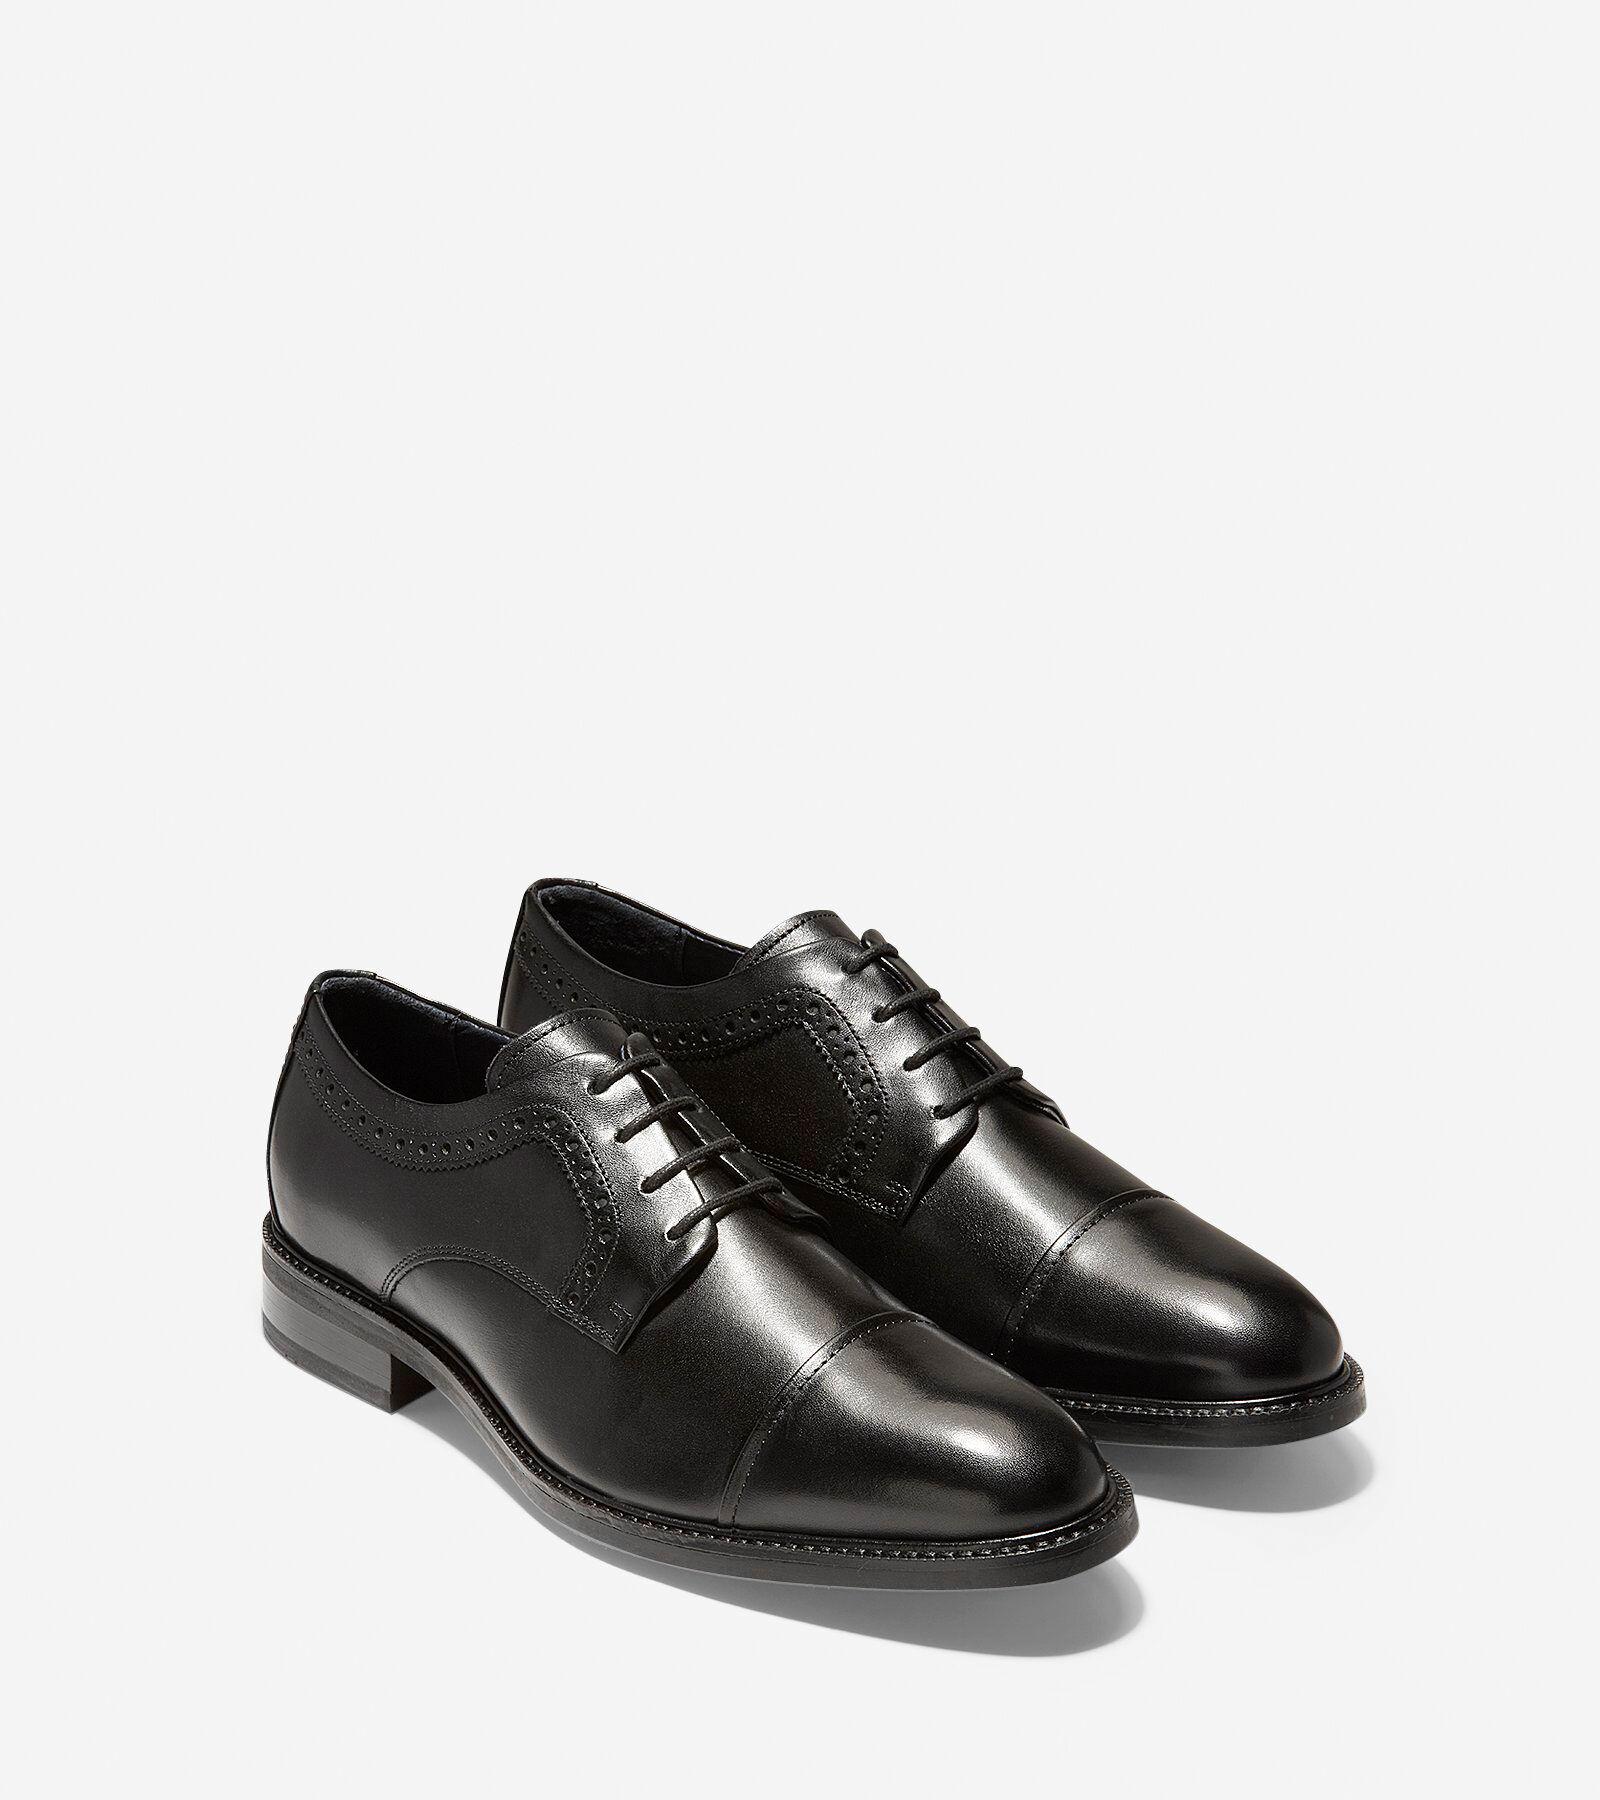 Men's Buckland Cap Oxford in Black